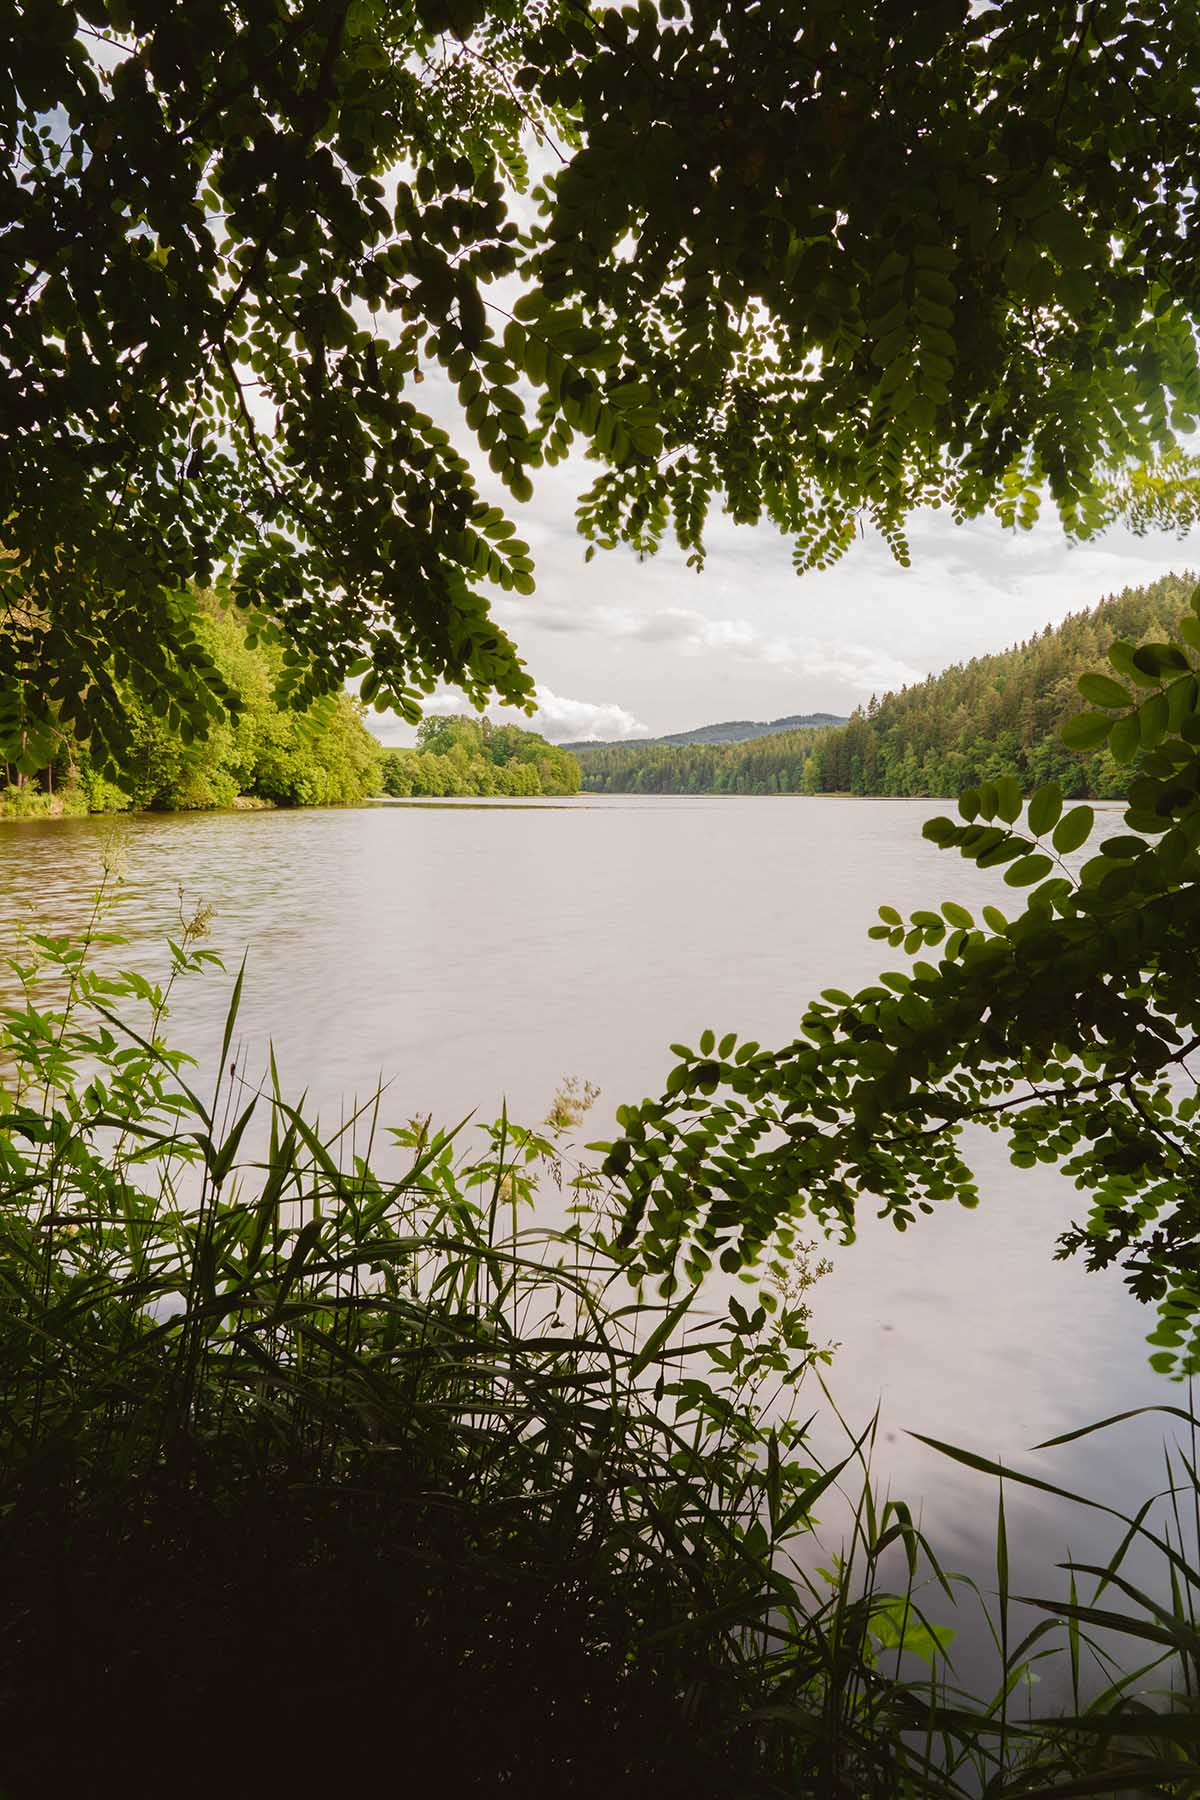 seen-bayerischer-wald-blaibacher-see-rundweg